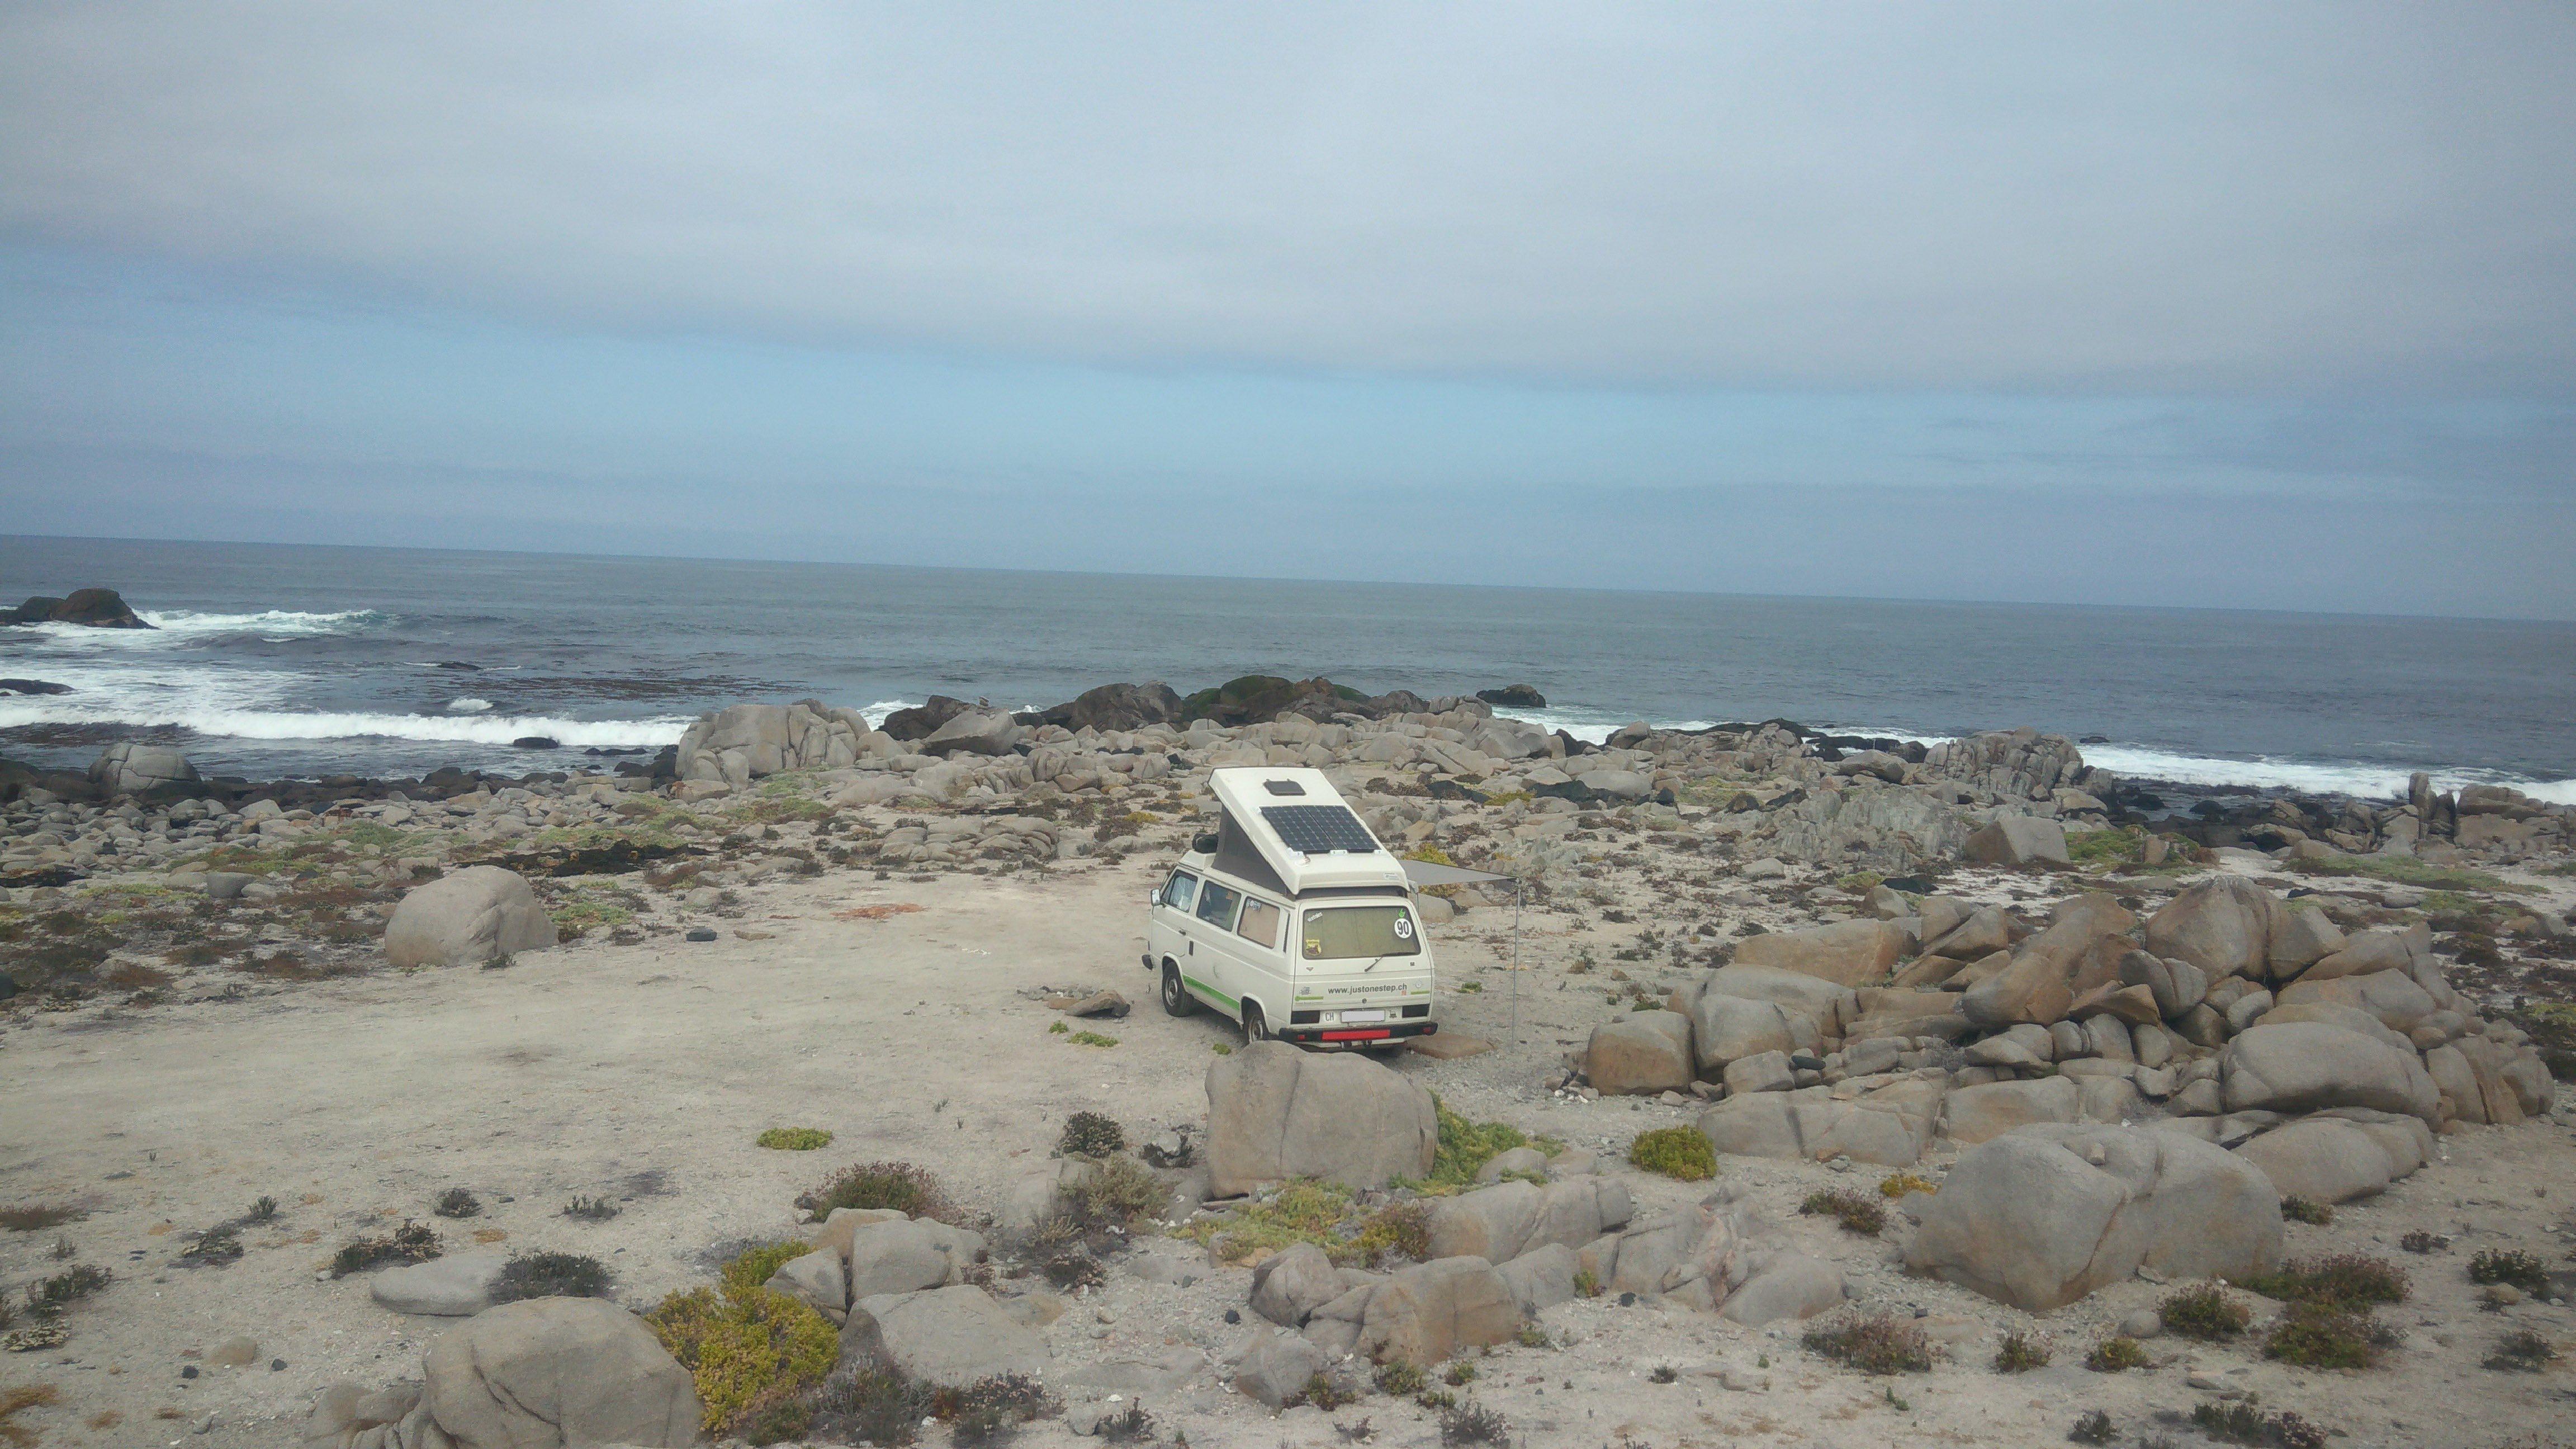 029 2212 PN Llanos del Challe 3jpg